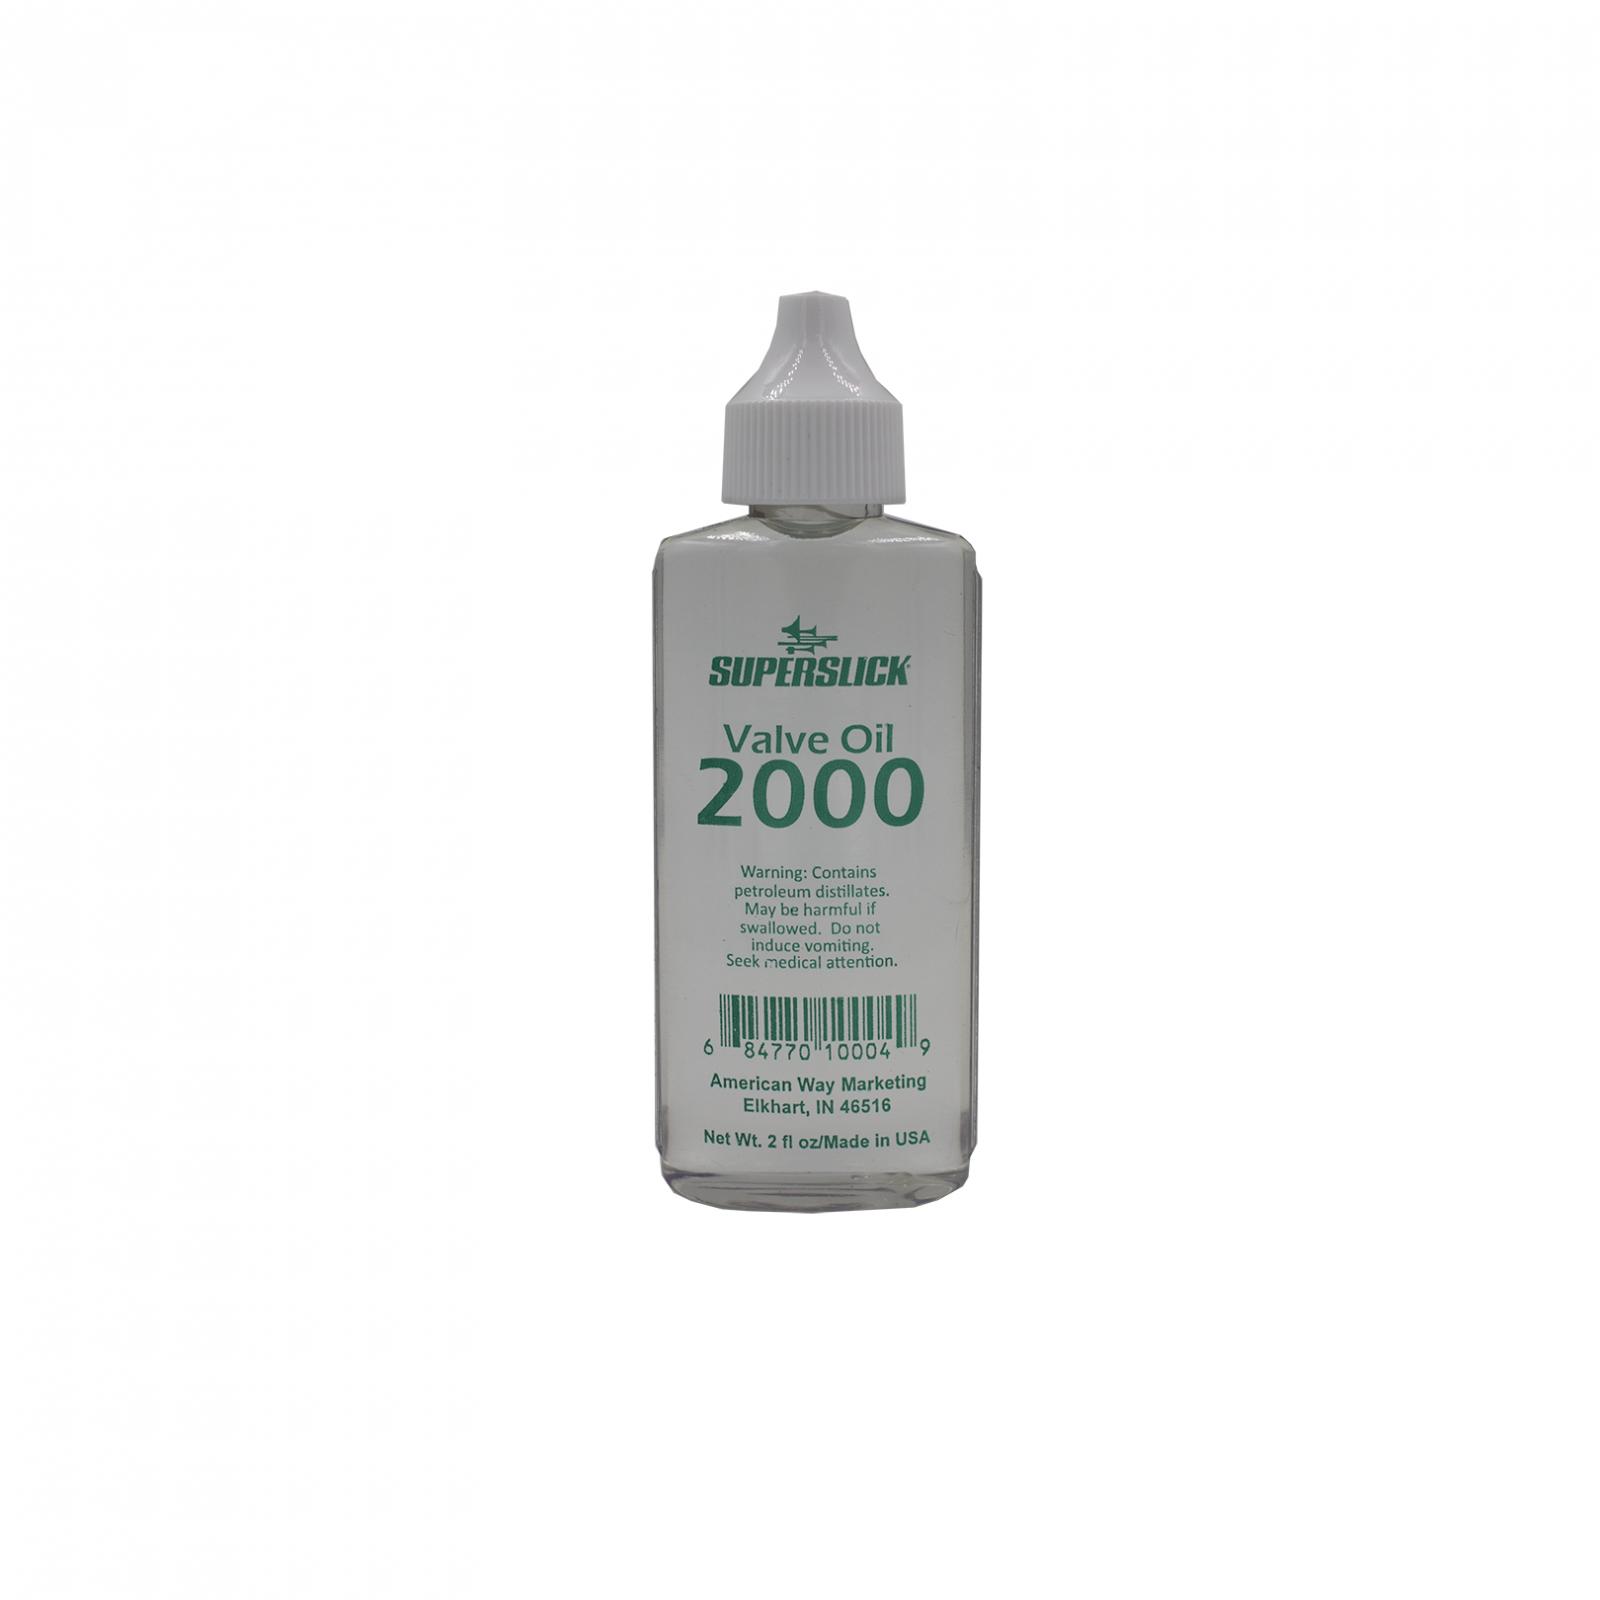 Superslick 2000 Valve Oil